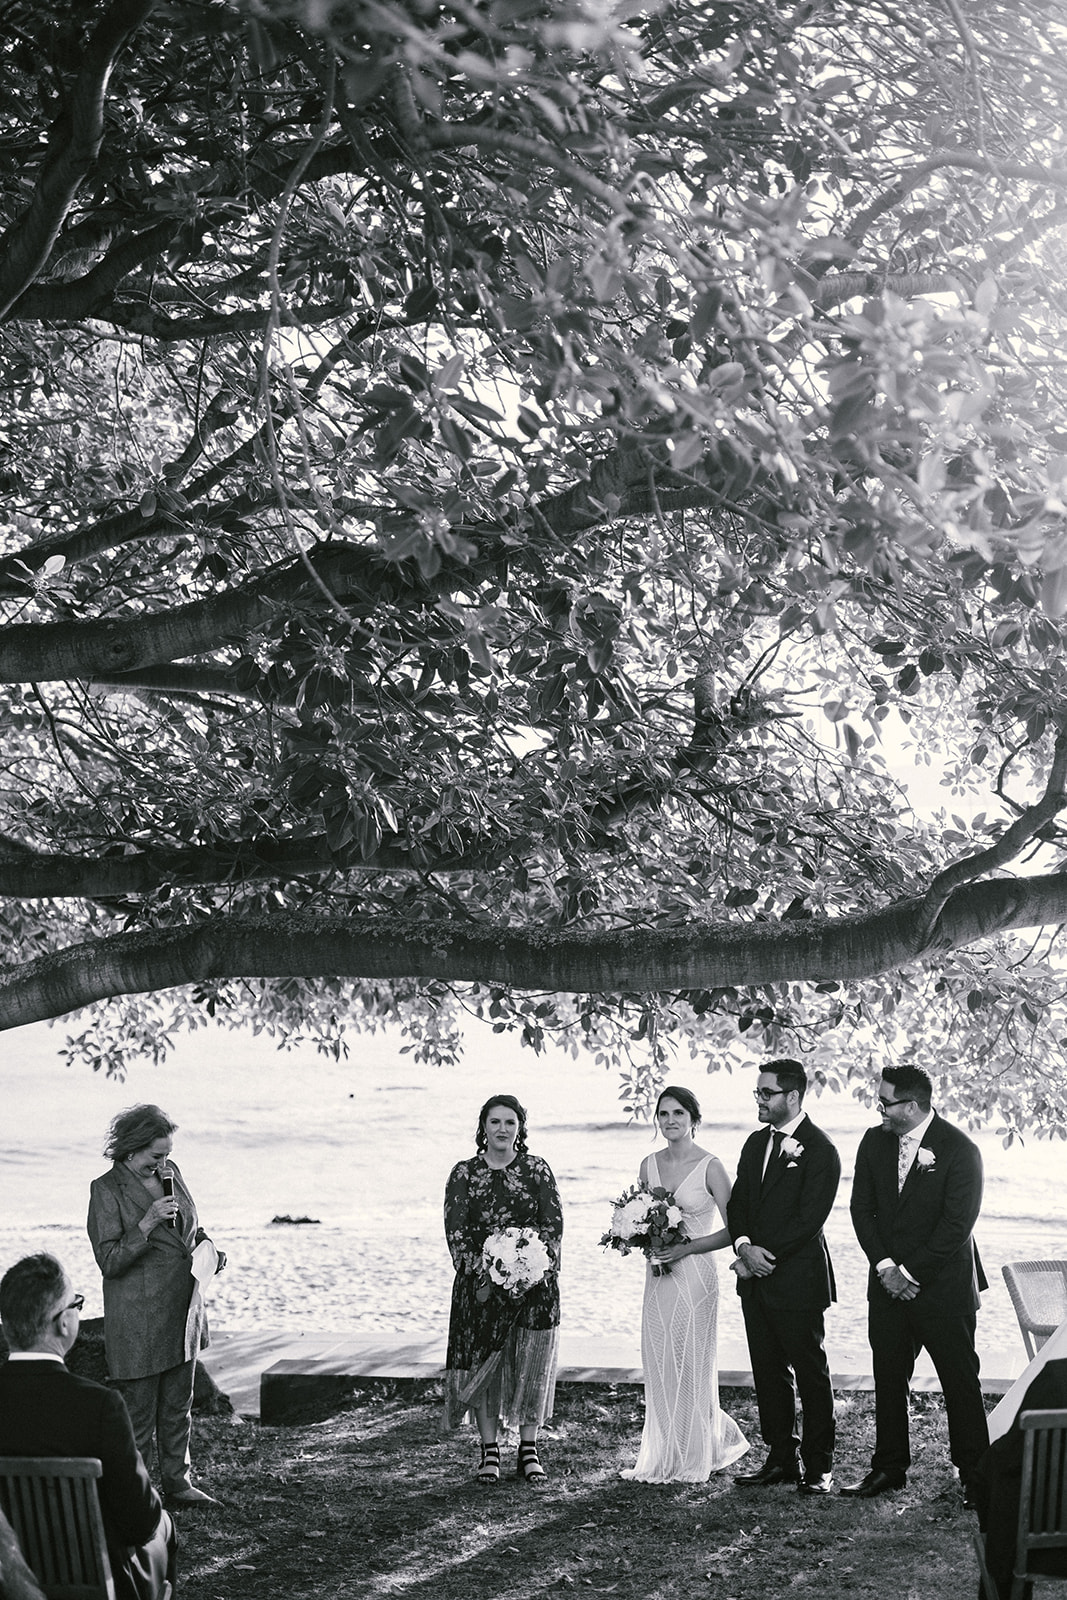 Glen-Marie Celebrant Belinda and Eduardo Tree.jpg